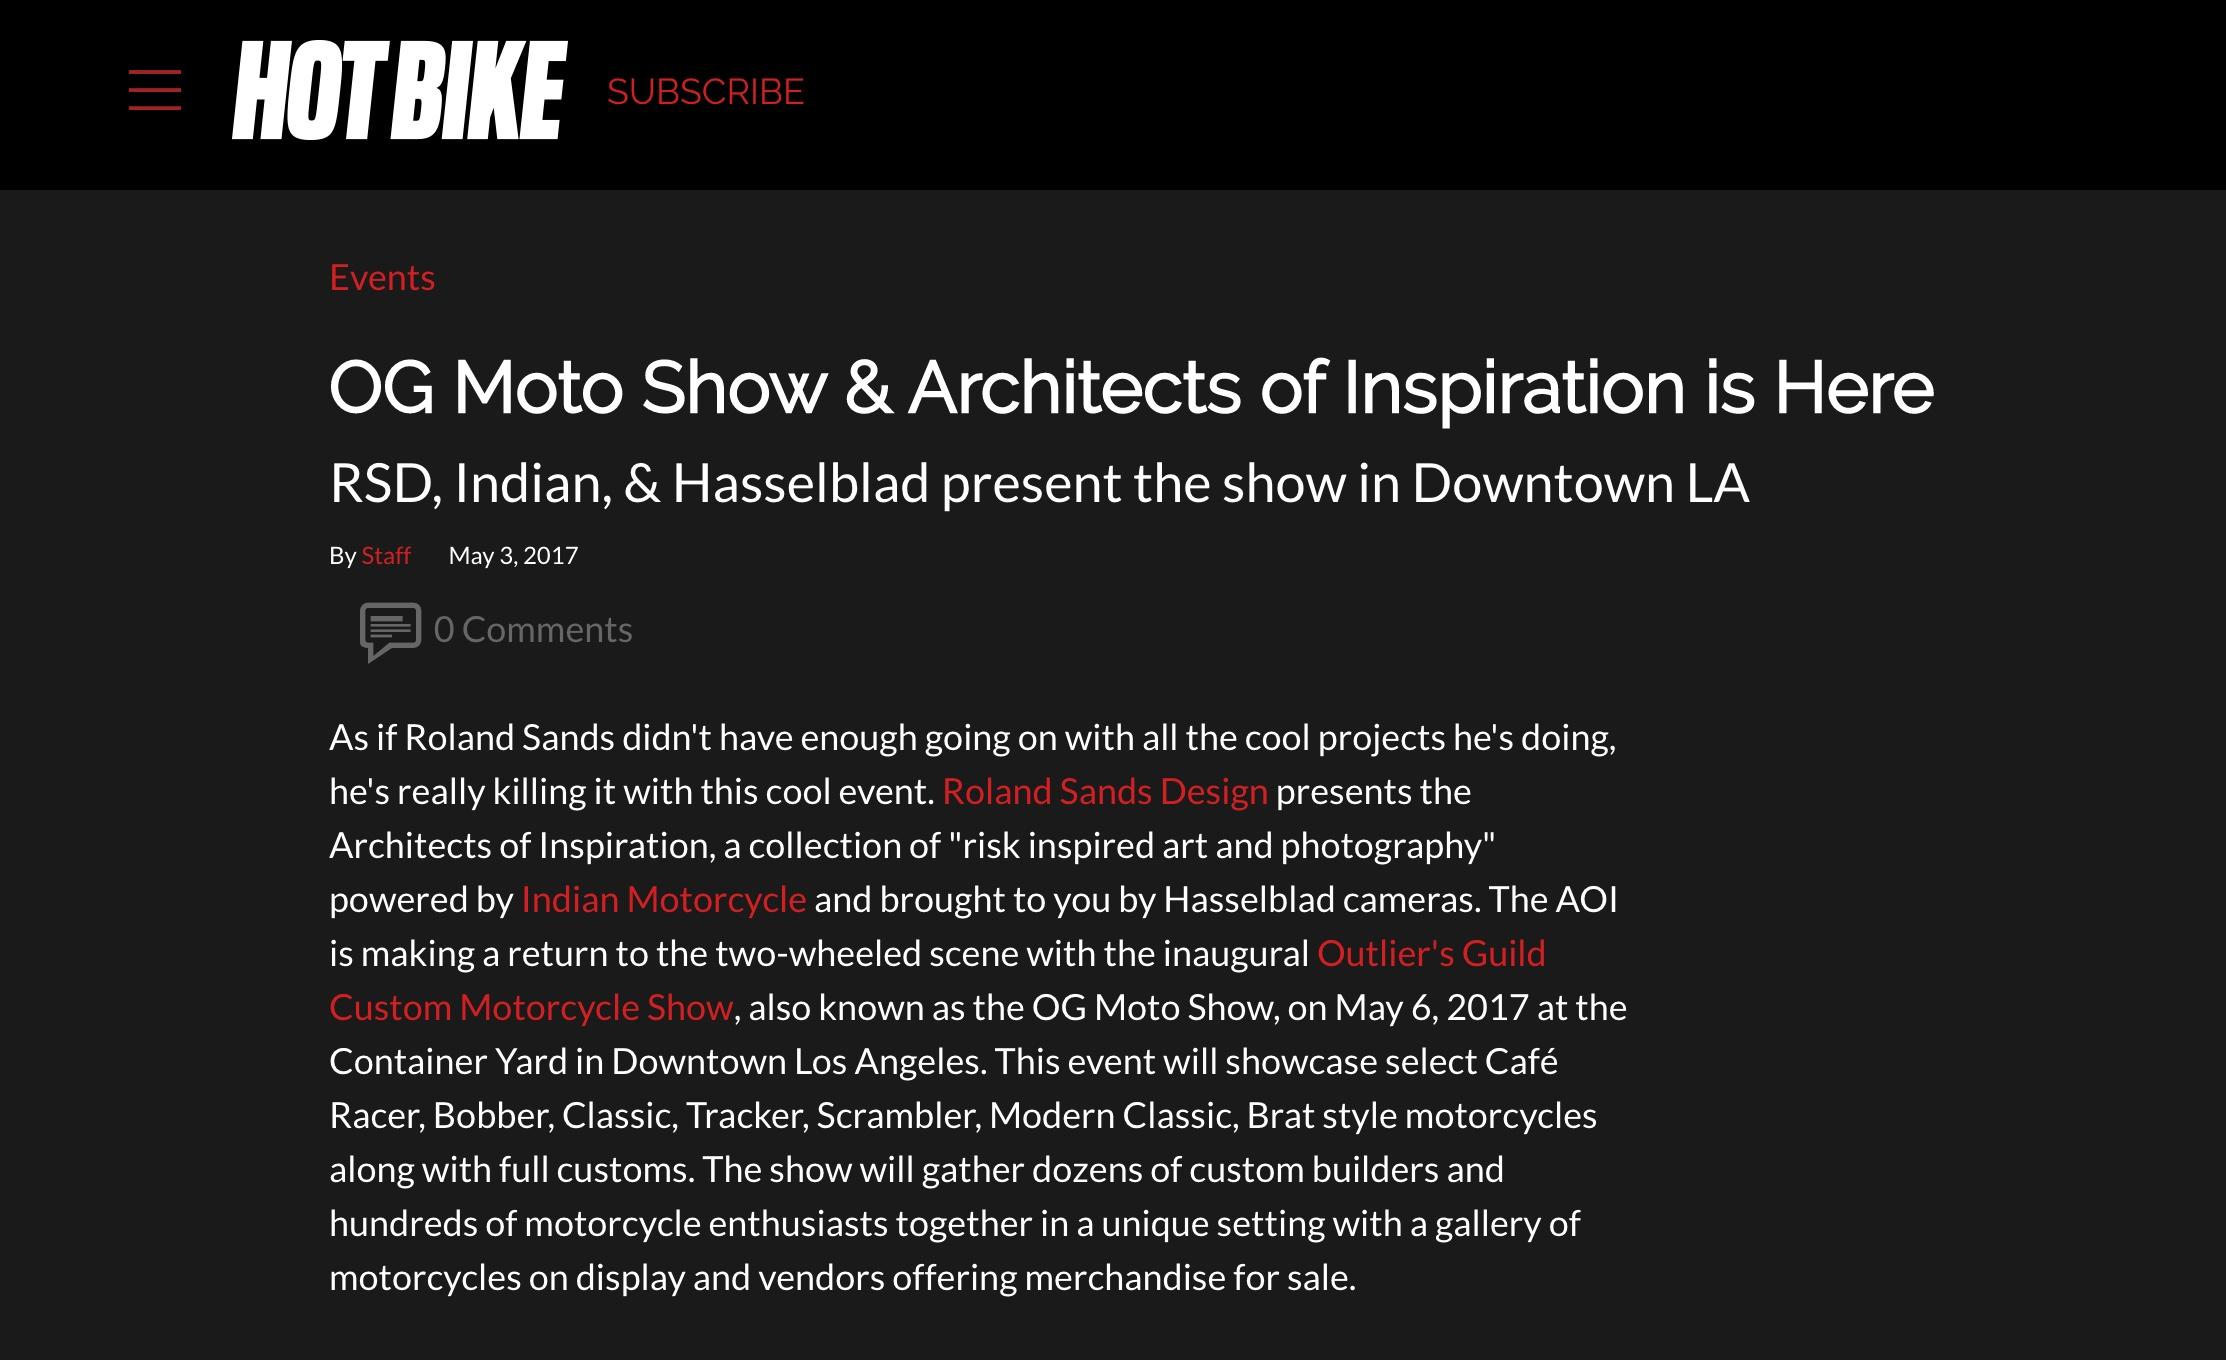 Announcement on Hot Bike